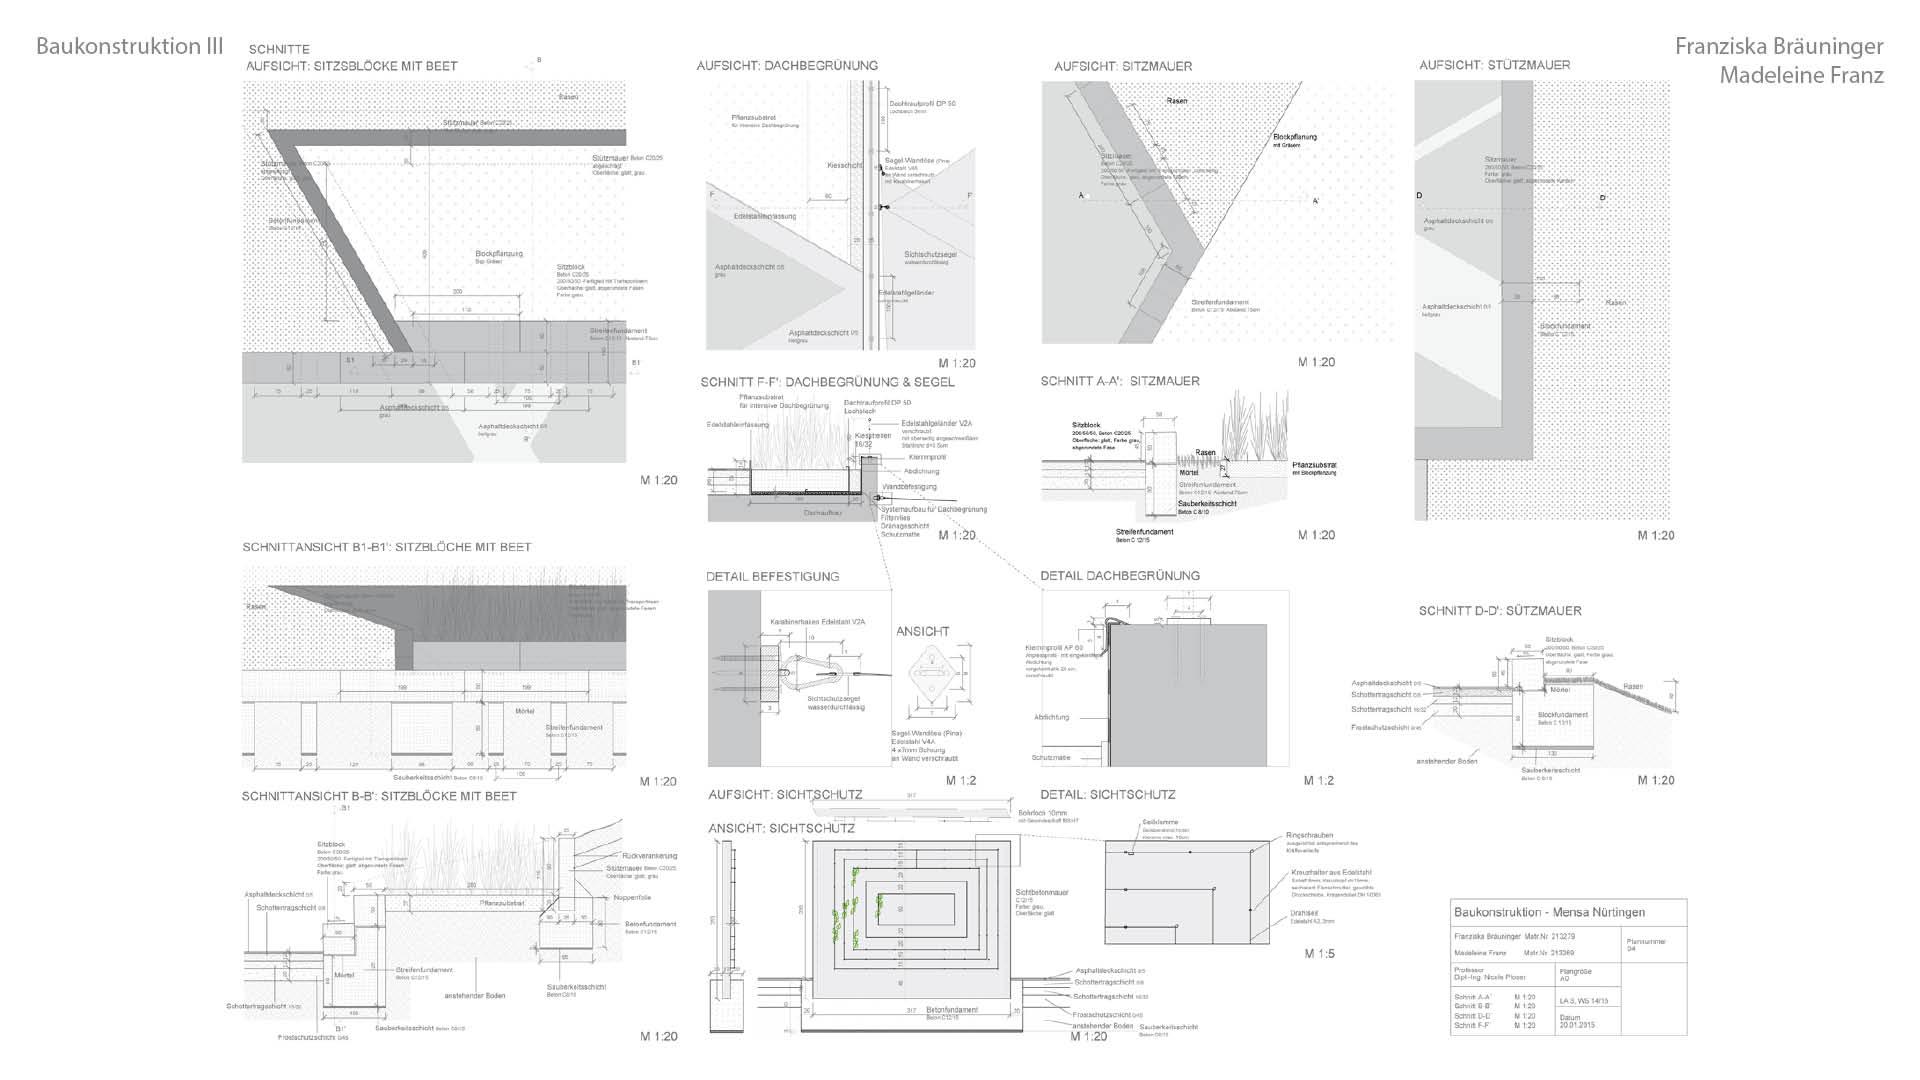 04 14 03 Baukonstruktion III